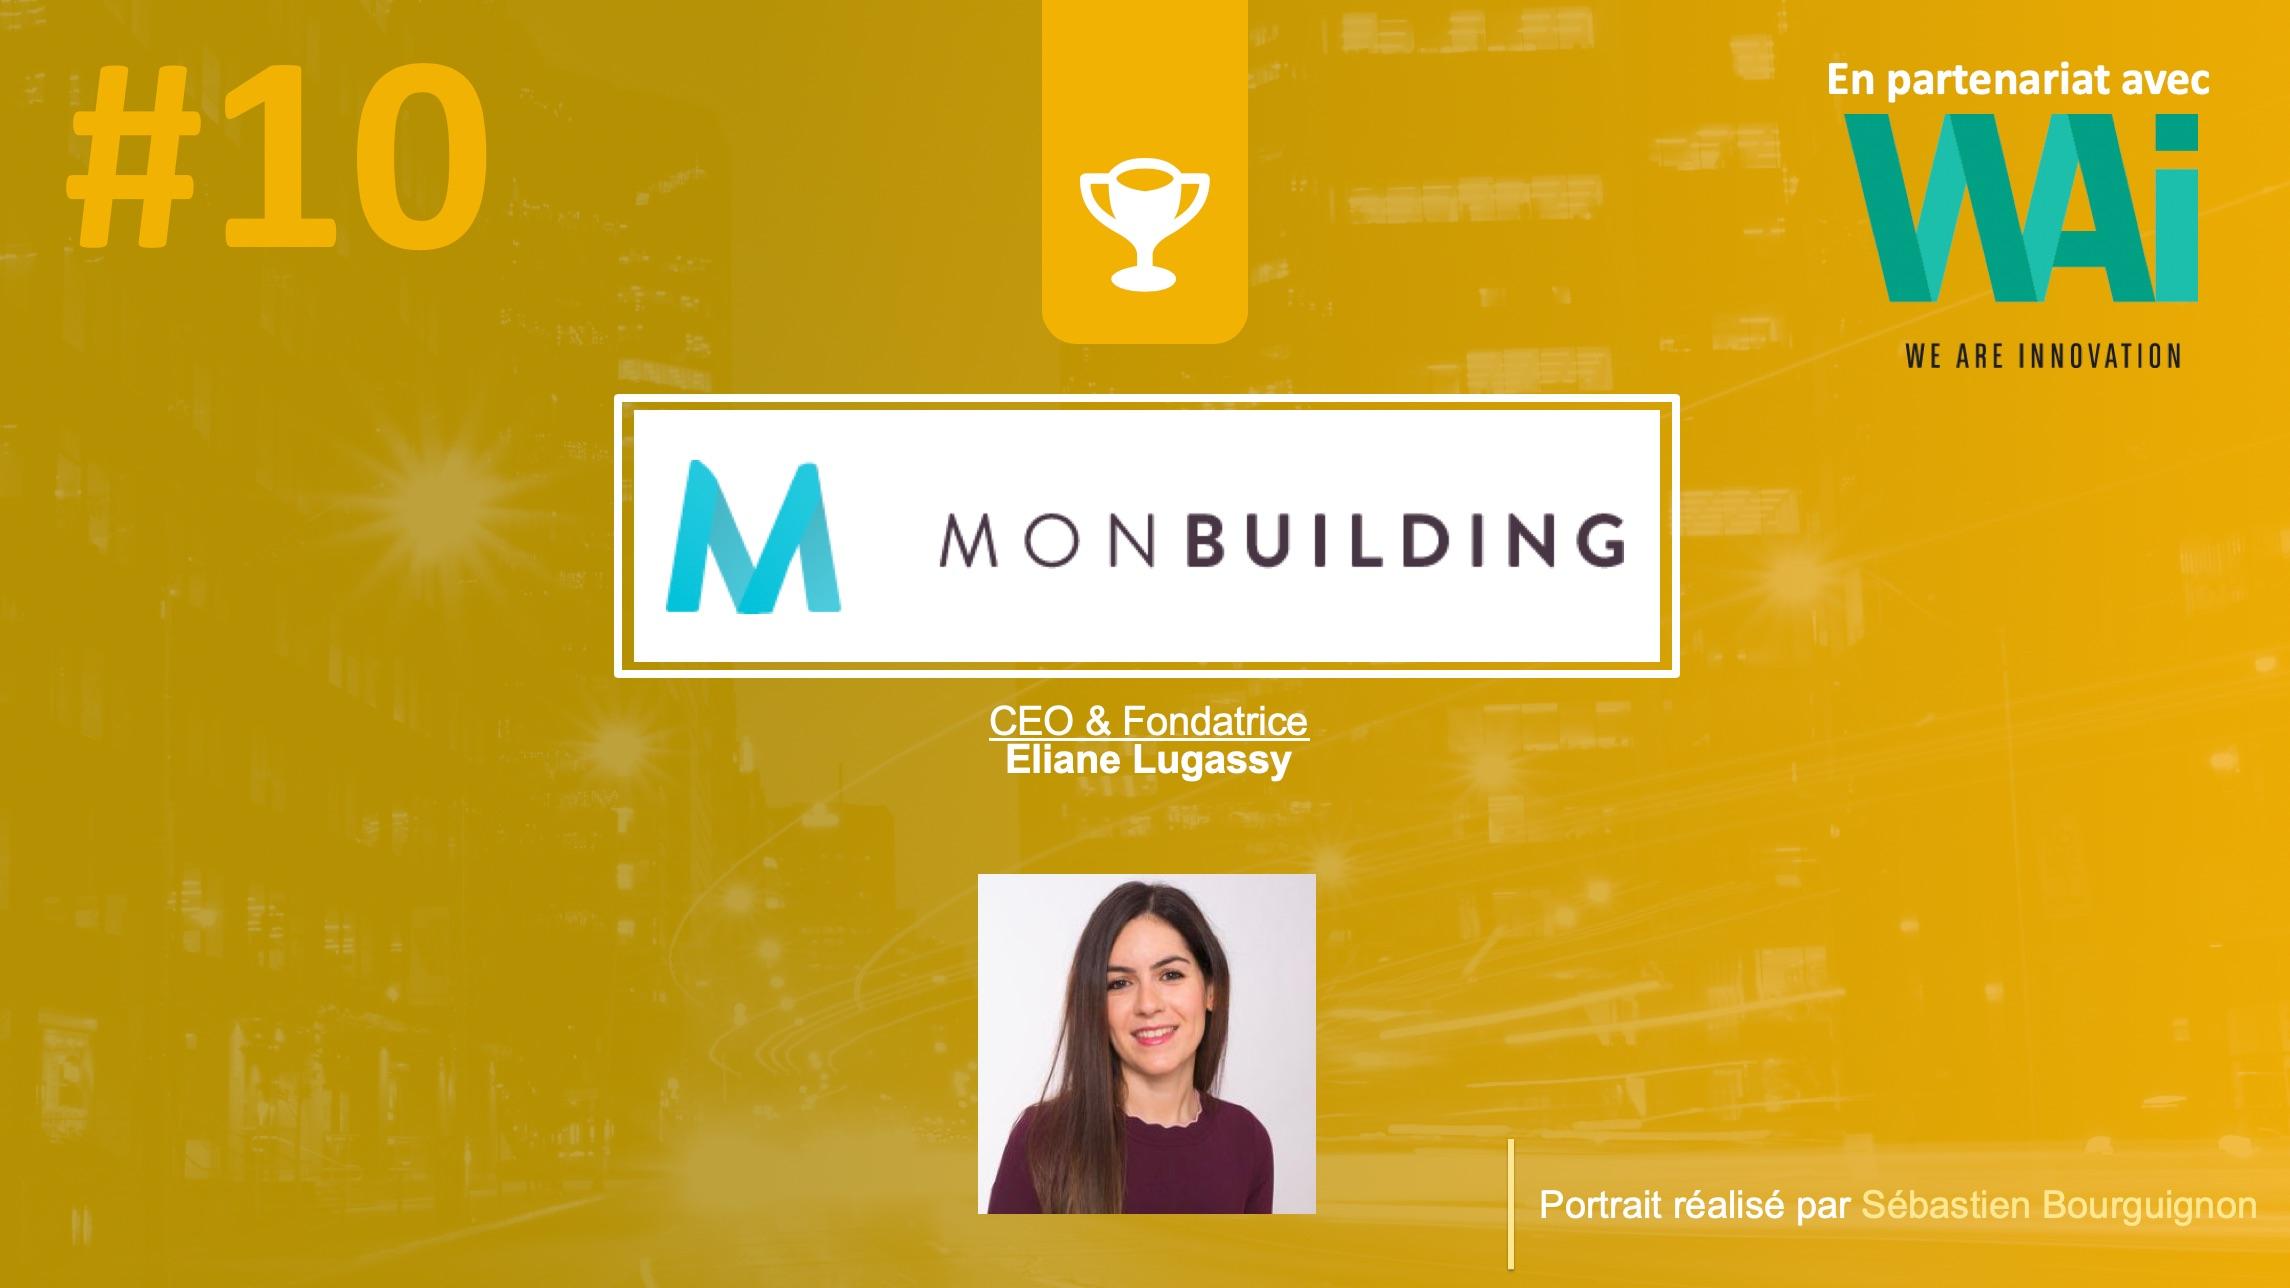 monbuilding